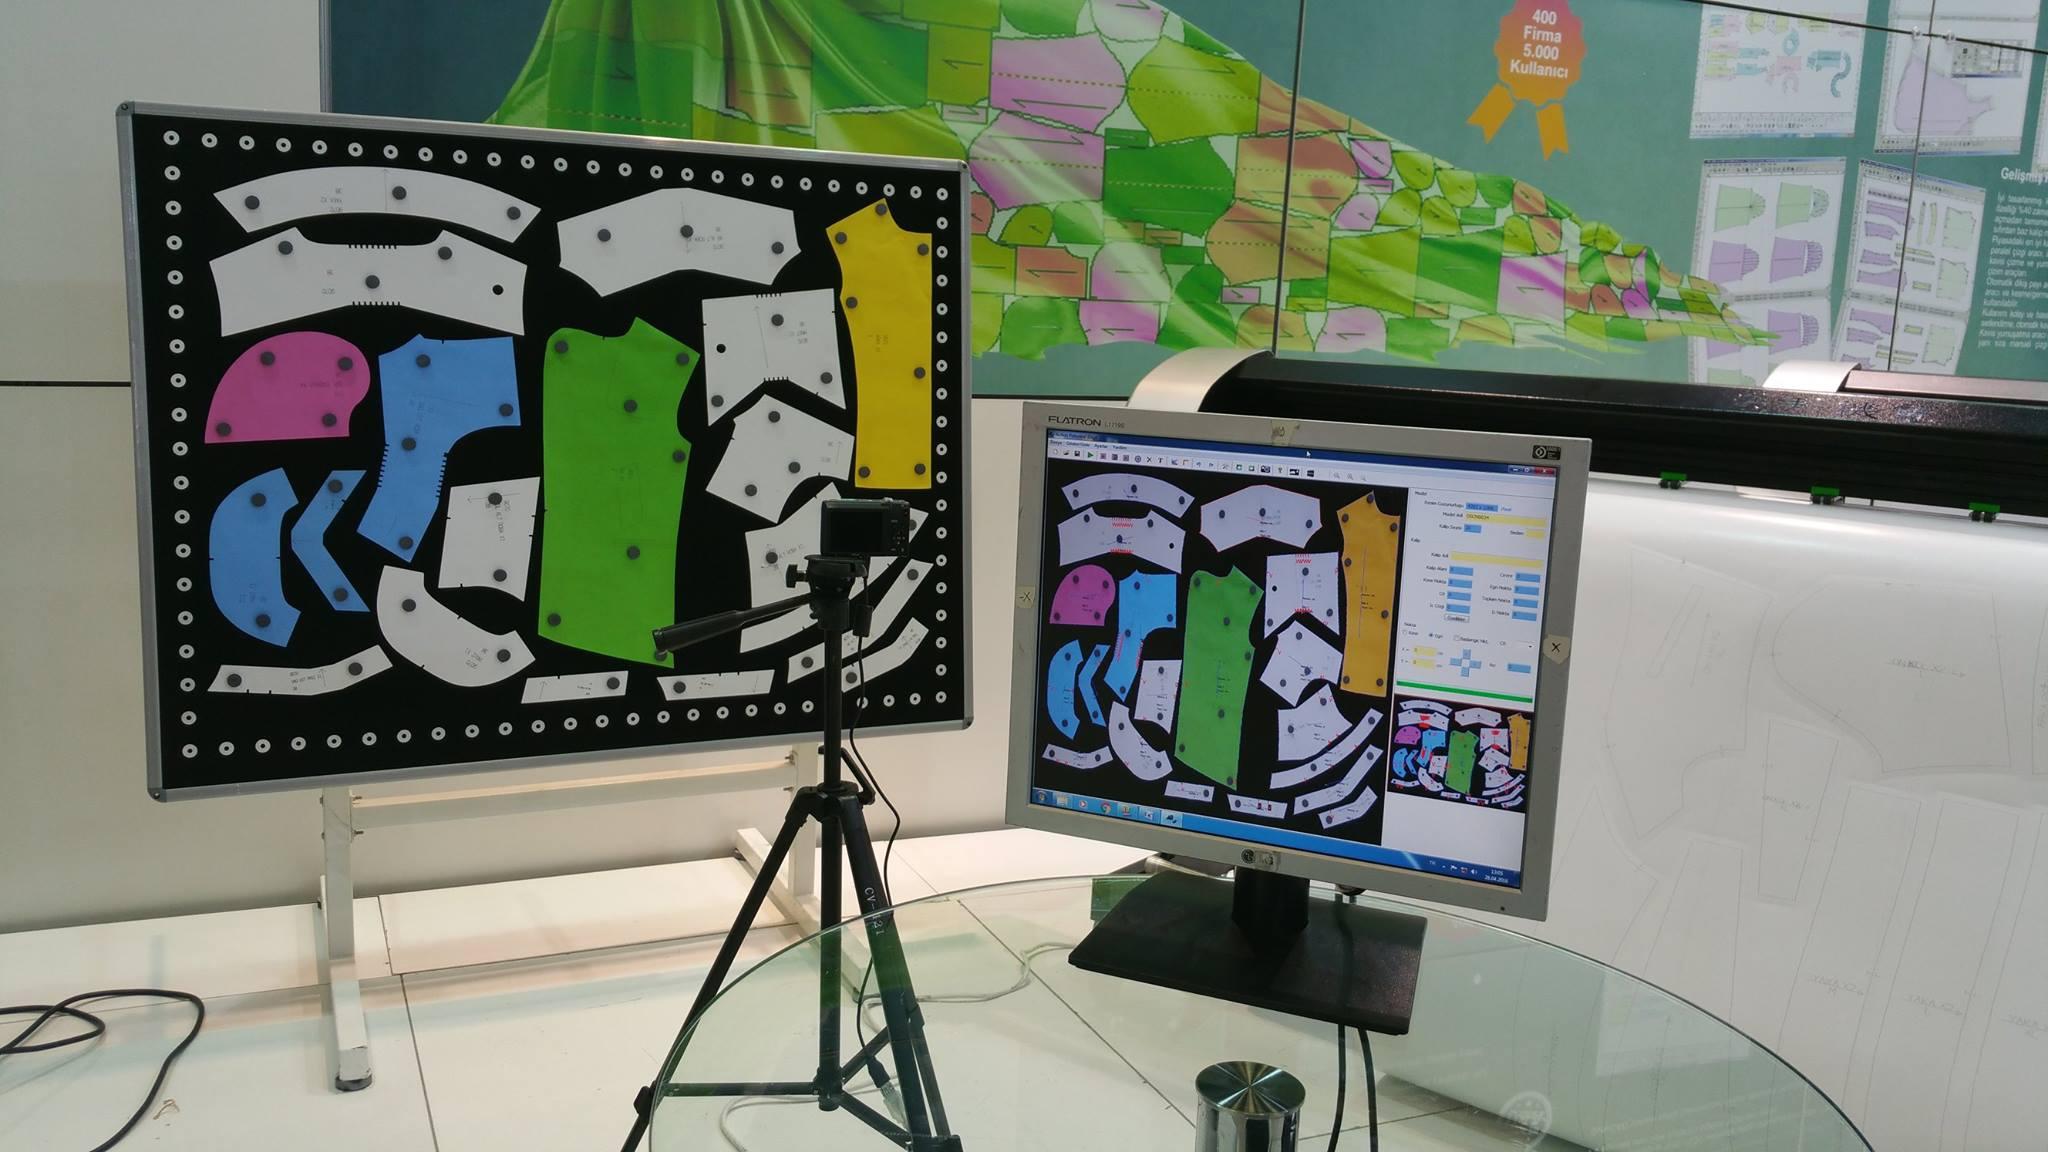 Tuyap, Textile, Machinery, CAD, Exhibition